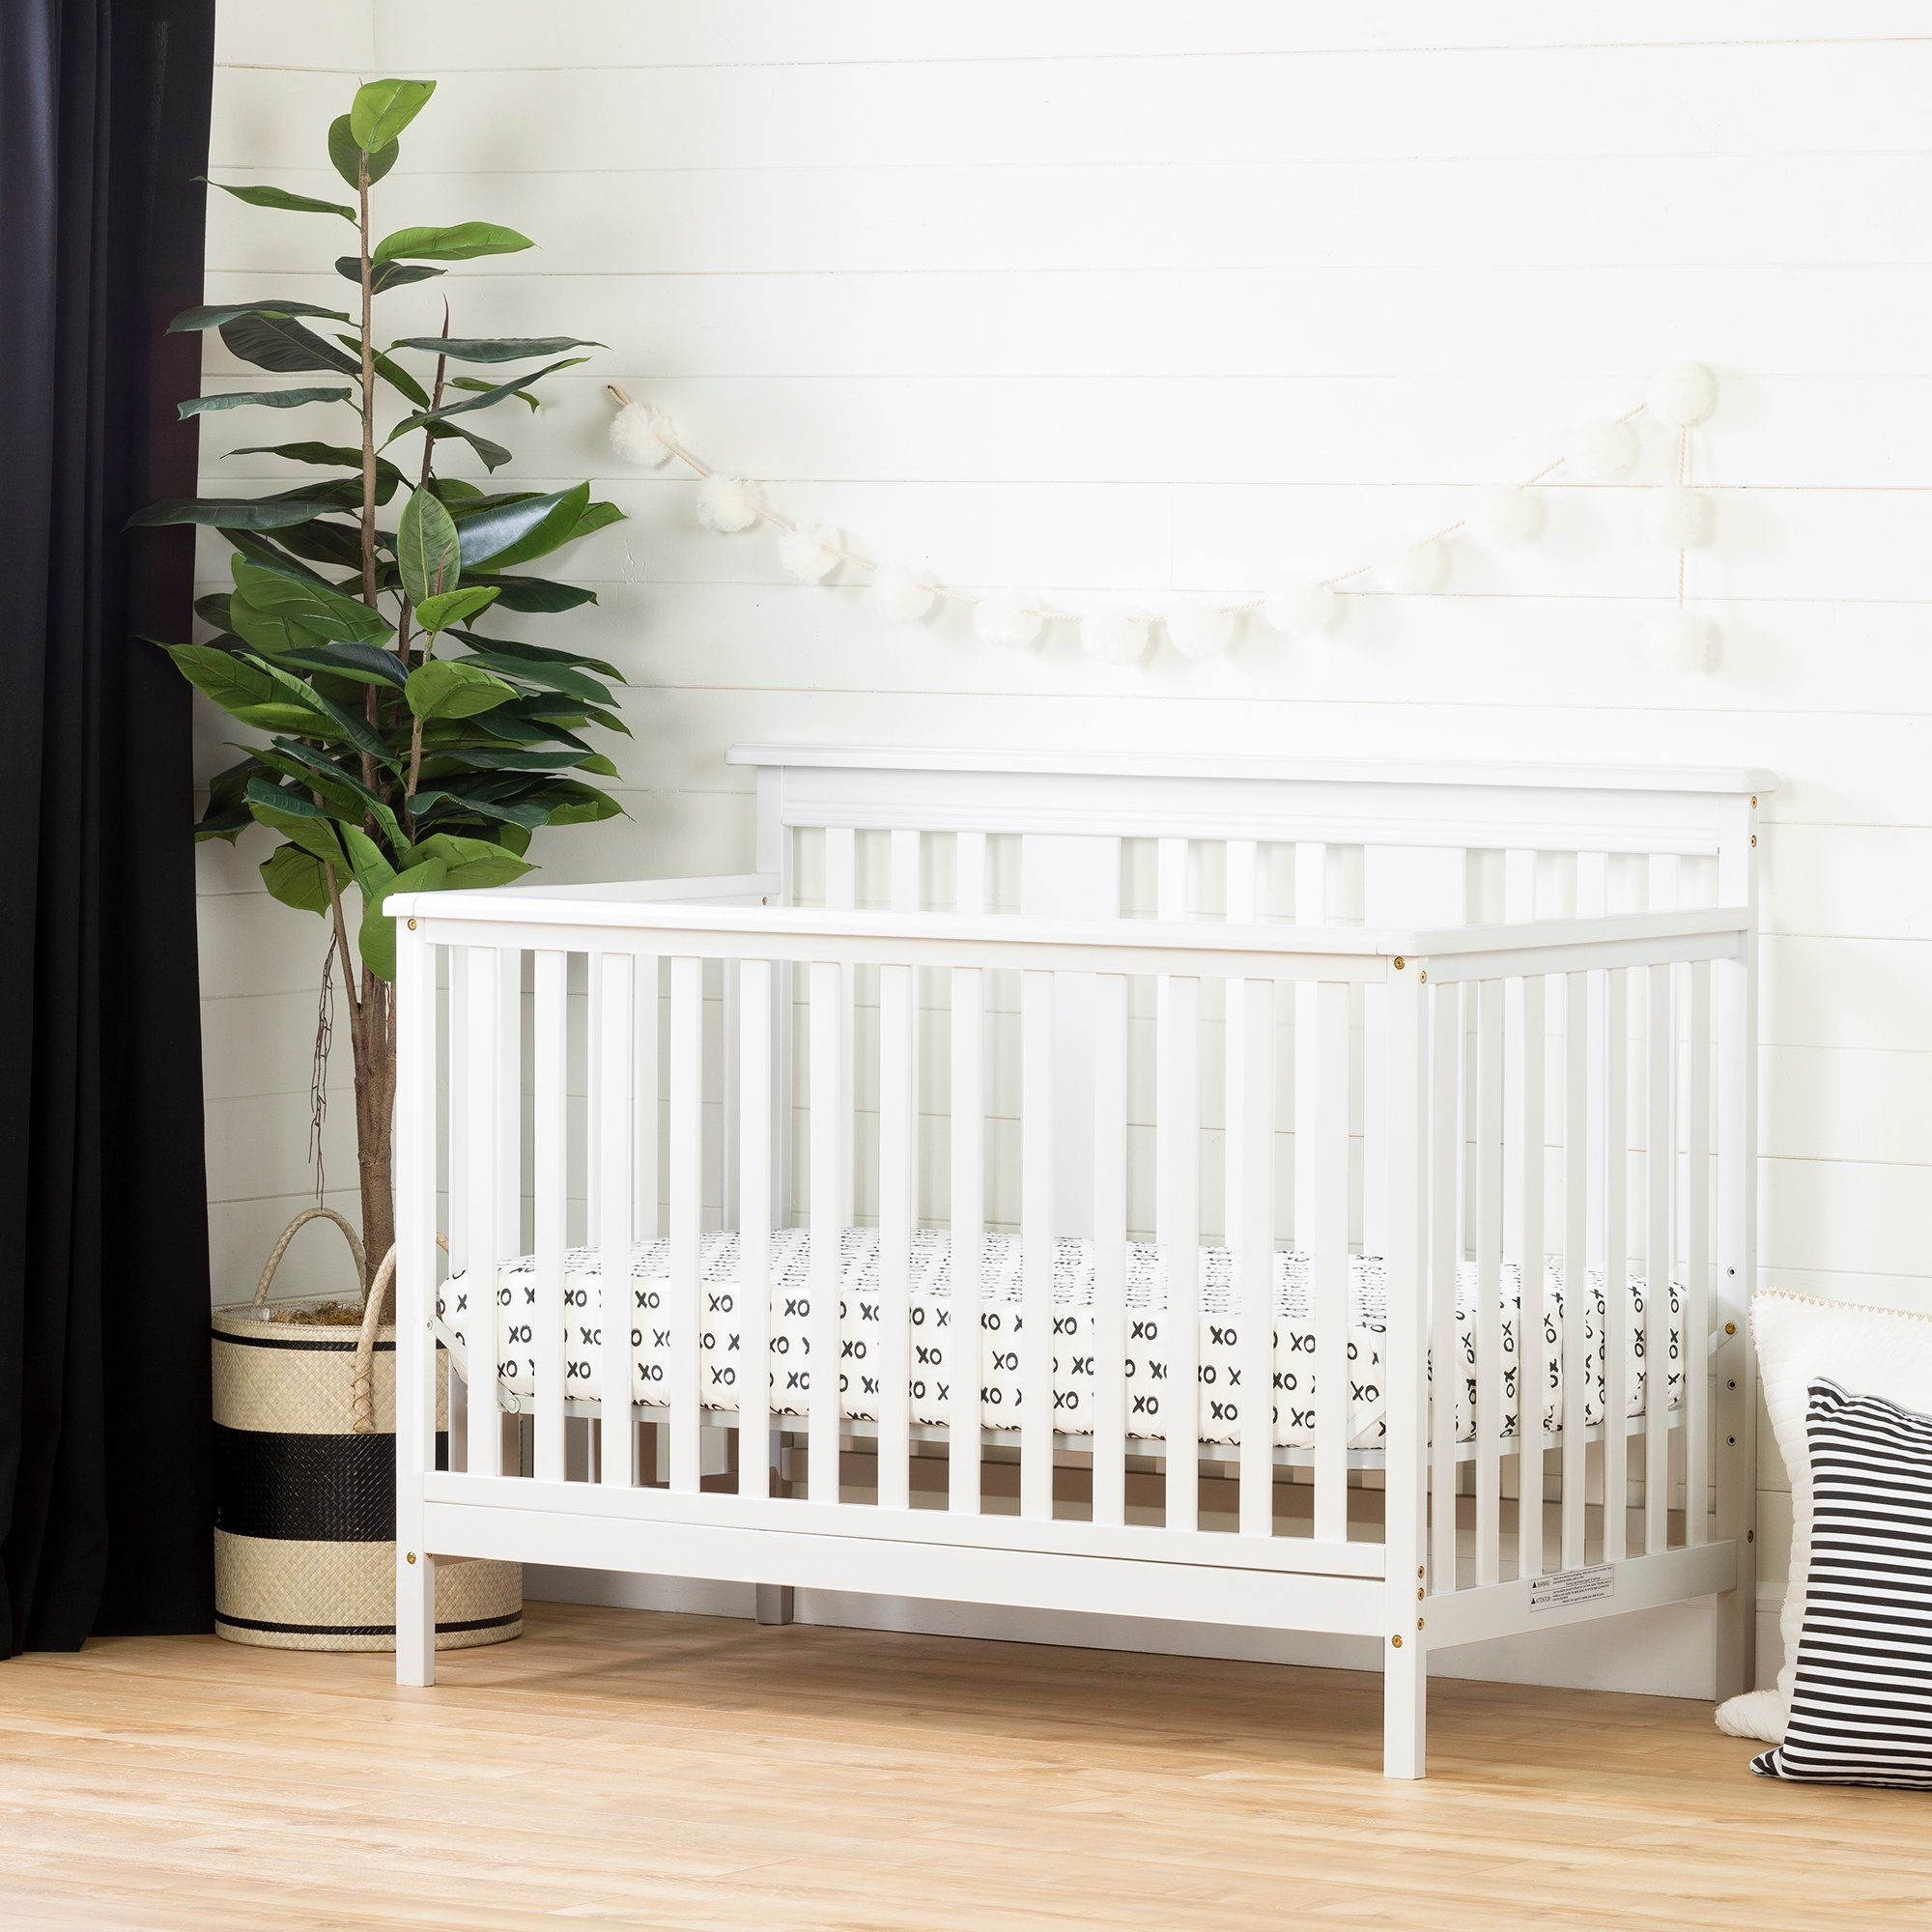 Modern White Crib With Toddler Rail Little Smileys In 2020 Modern Baby Cribs Cribs Crib Toddler Bed